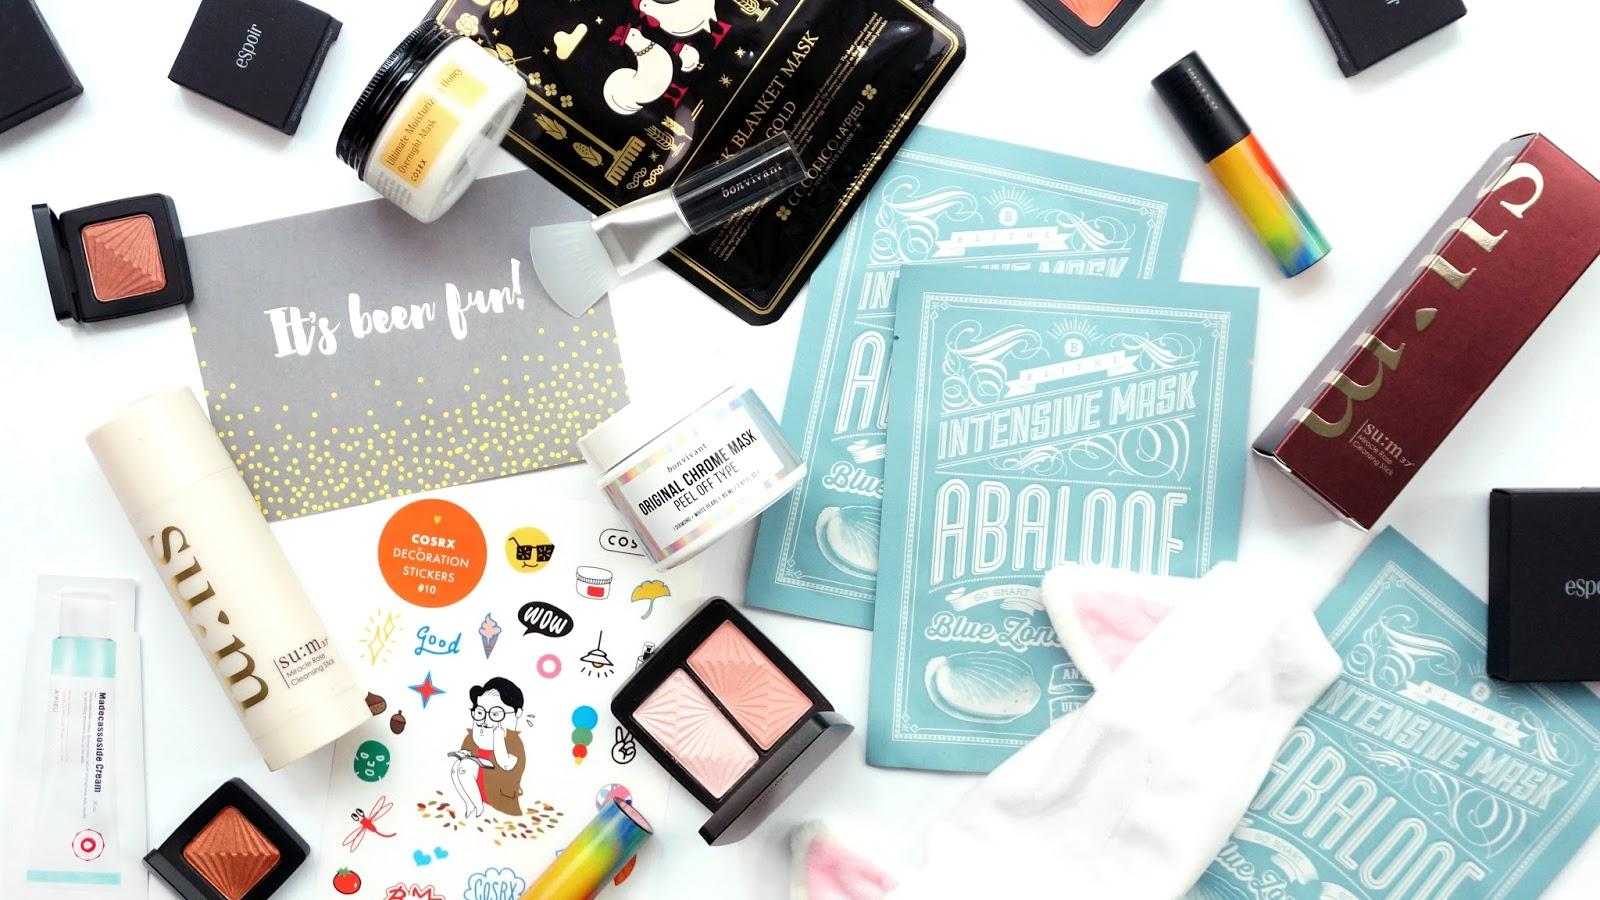 Korean Beauty Skincare Haul With Shopandbox And Giveaway Thehanihanii